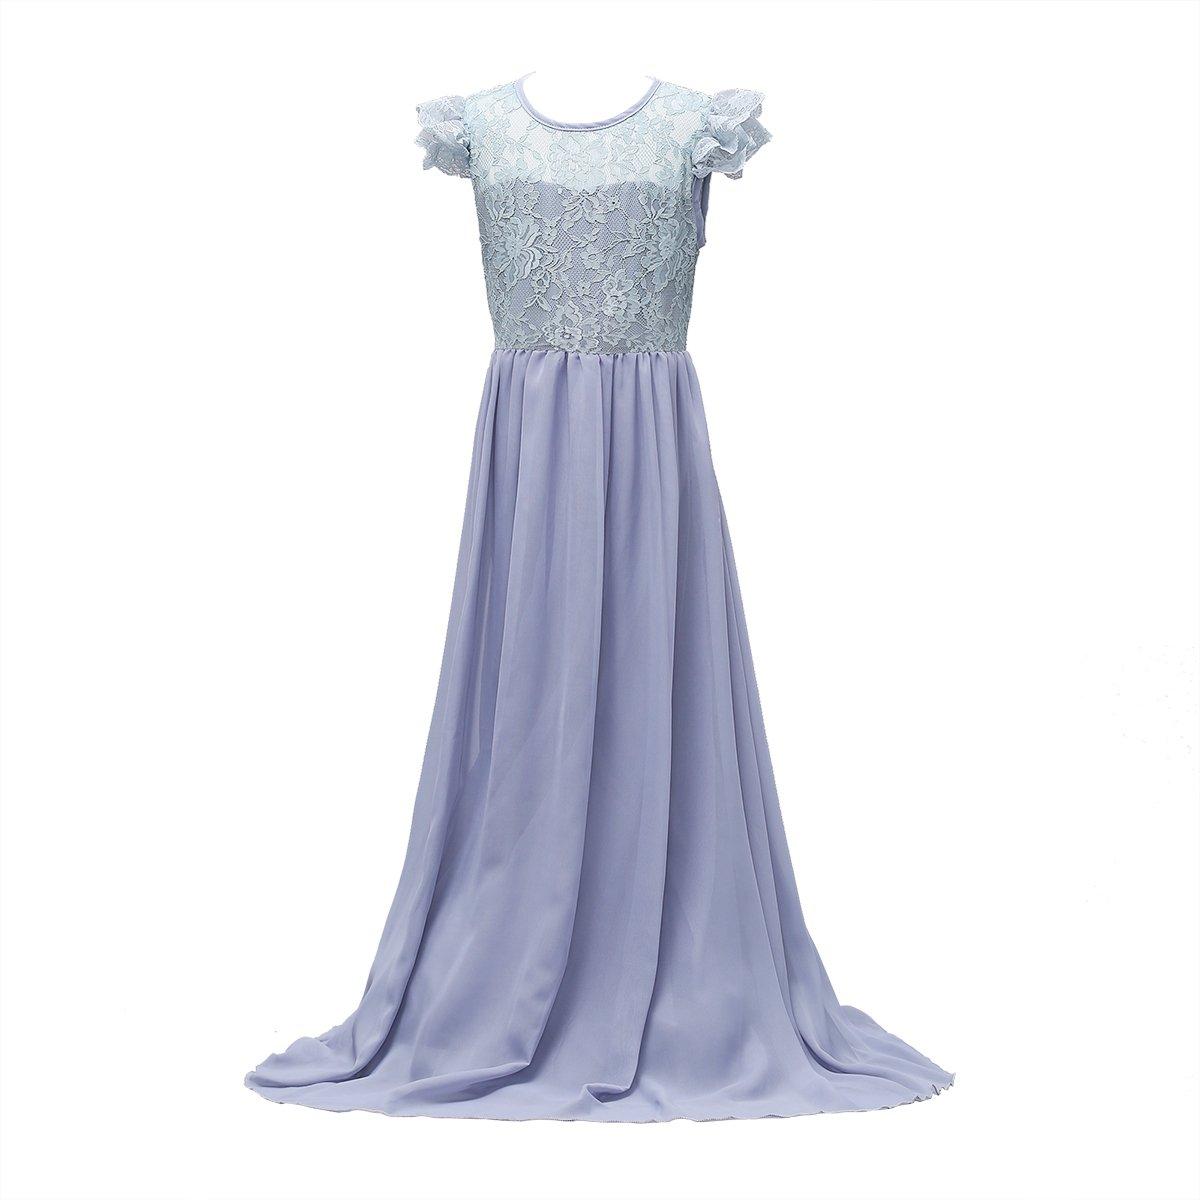 756a6b8ed29e Amazon.com  Glamulice Big Girls Lace Chiffon Floor Length Dress ...